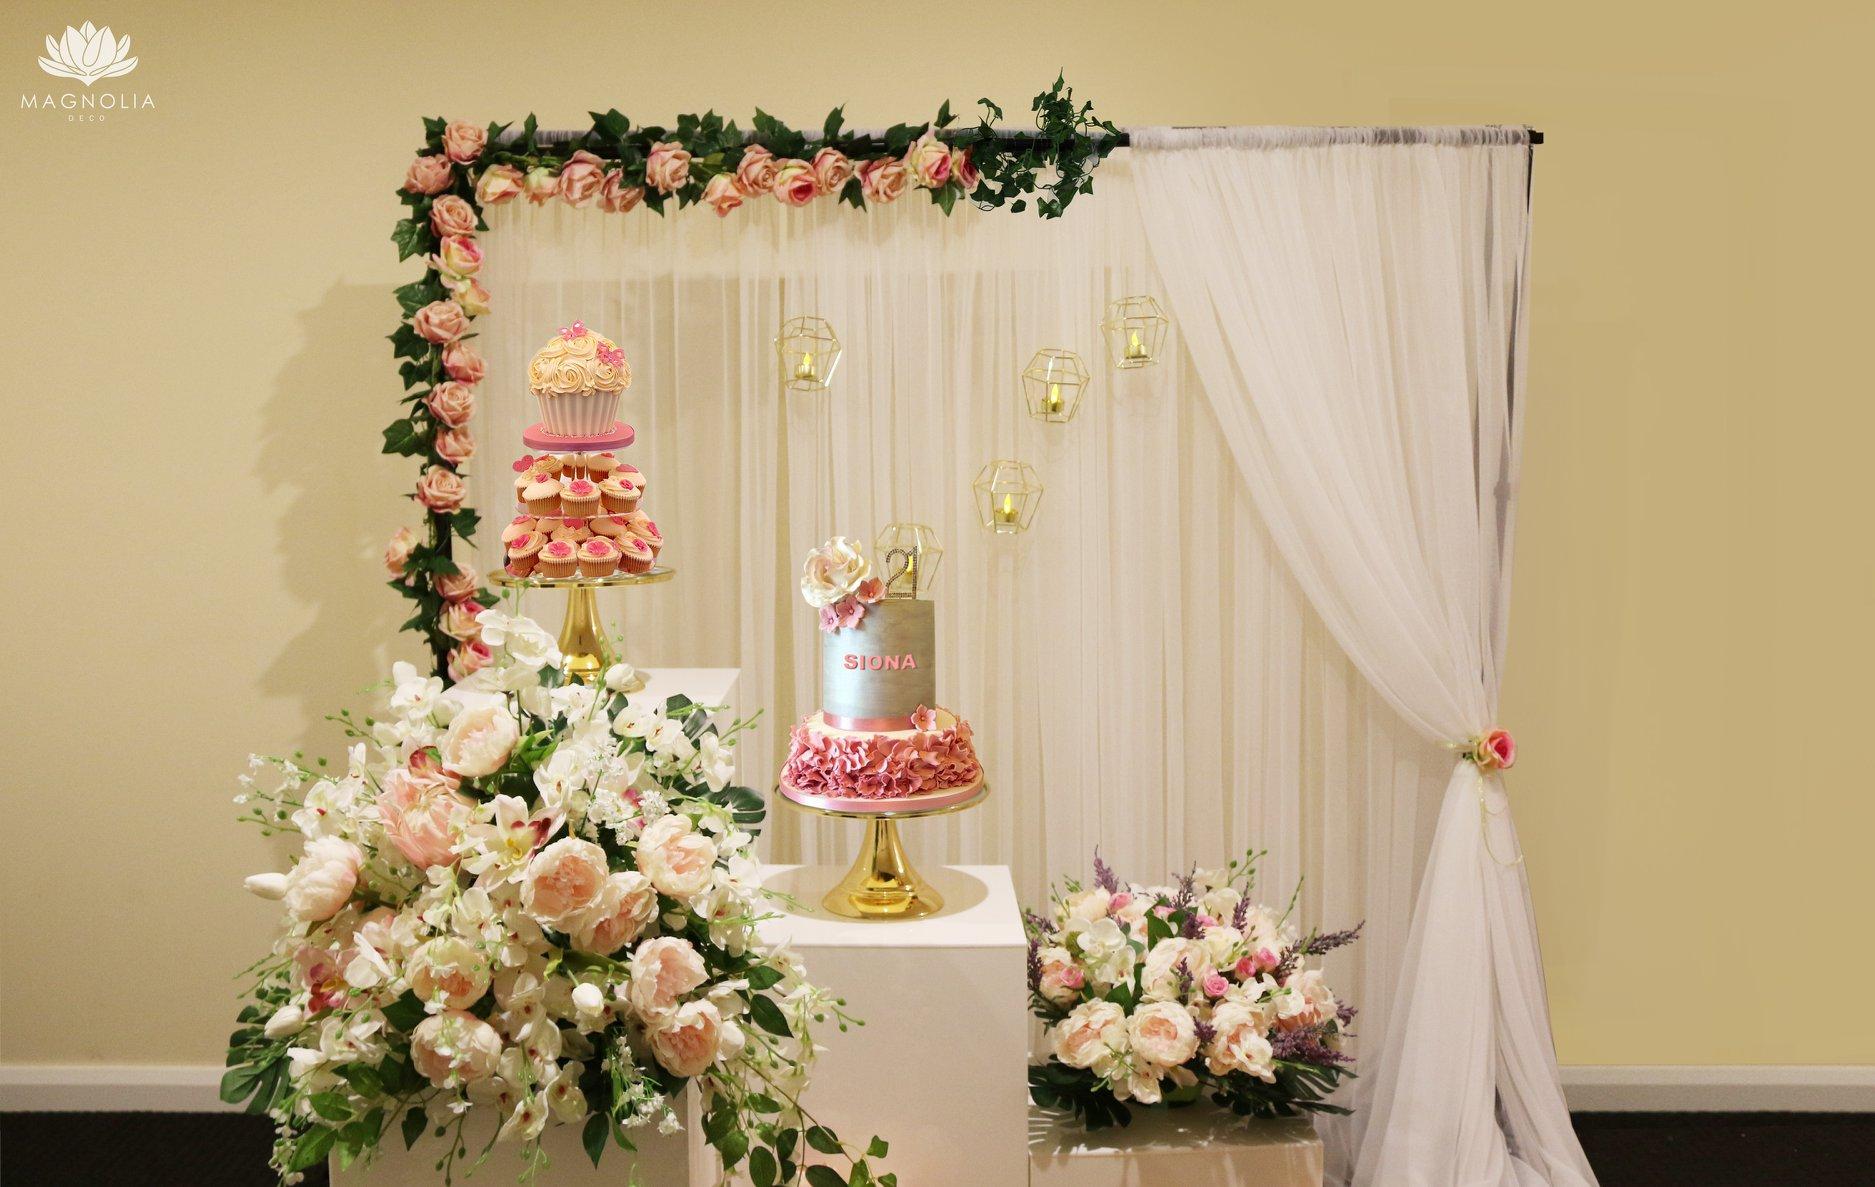 Teen Birthday Parties Magnolia Deco